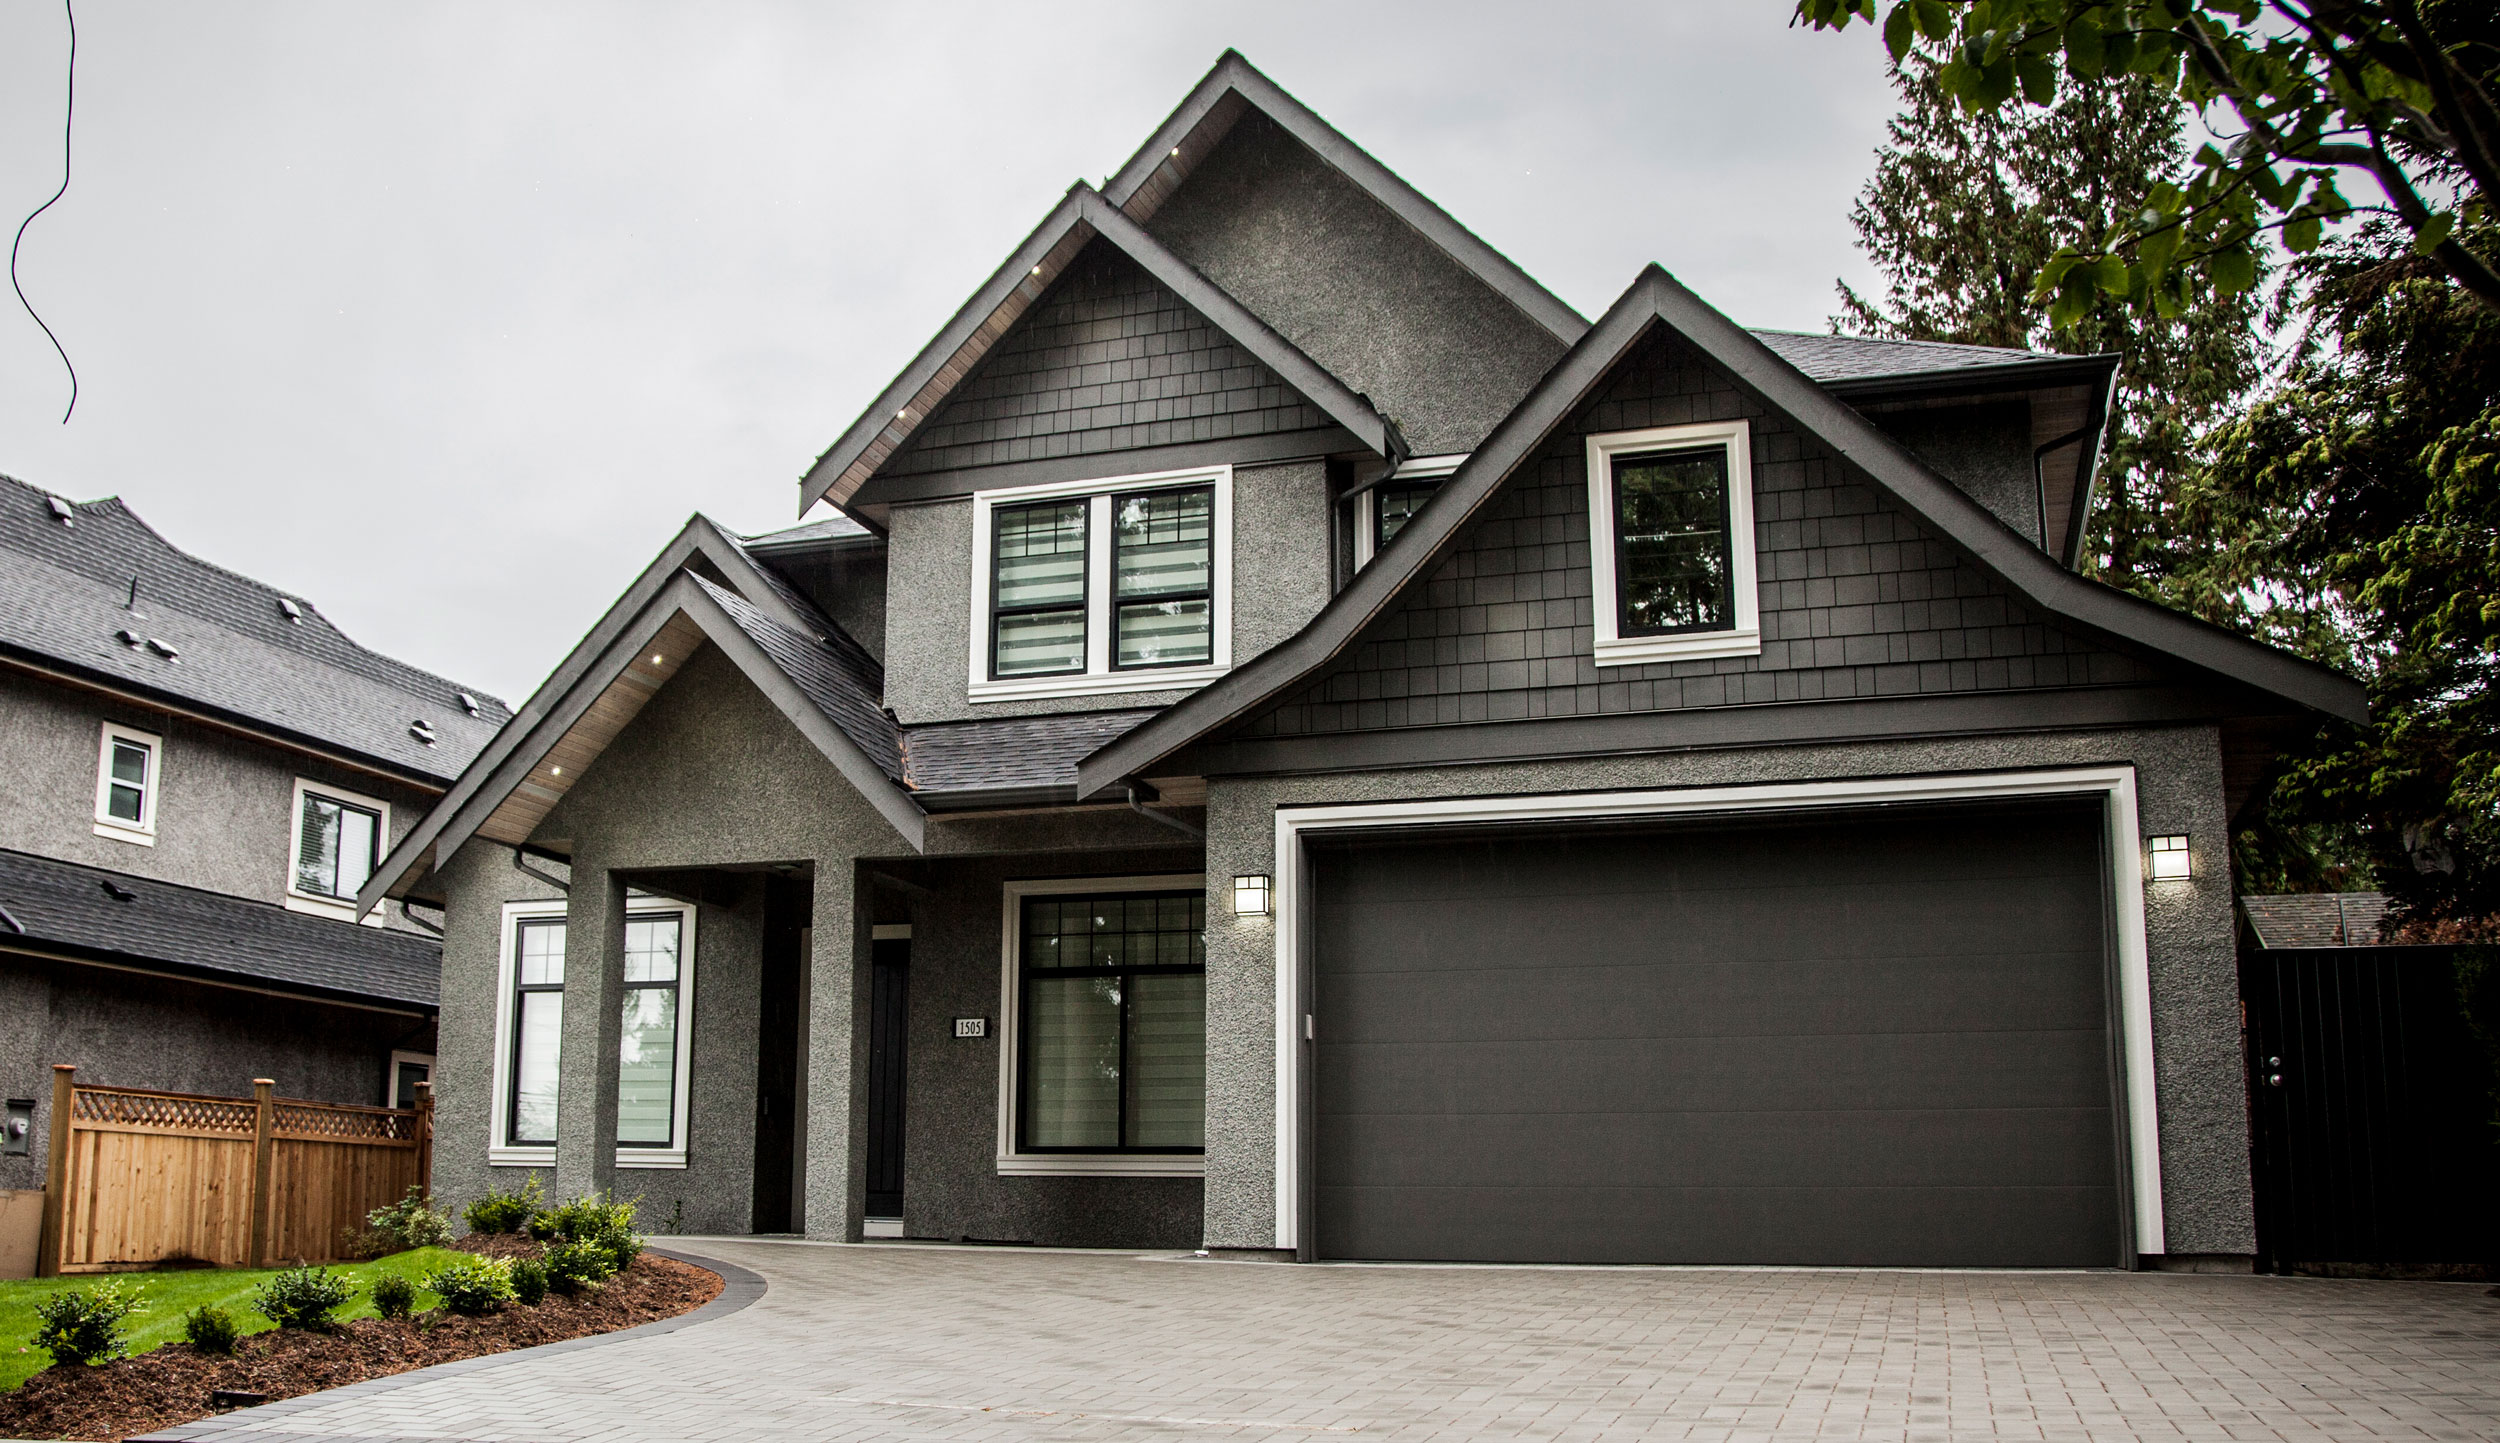 Major Homes